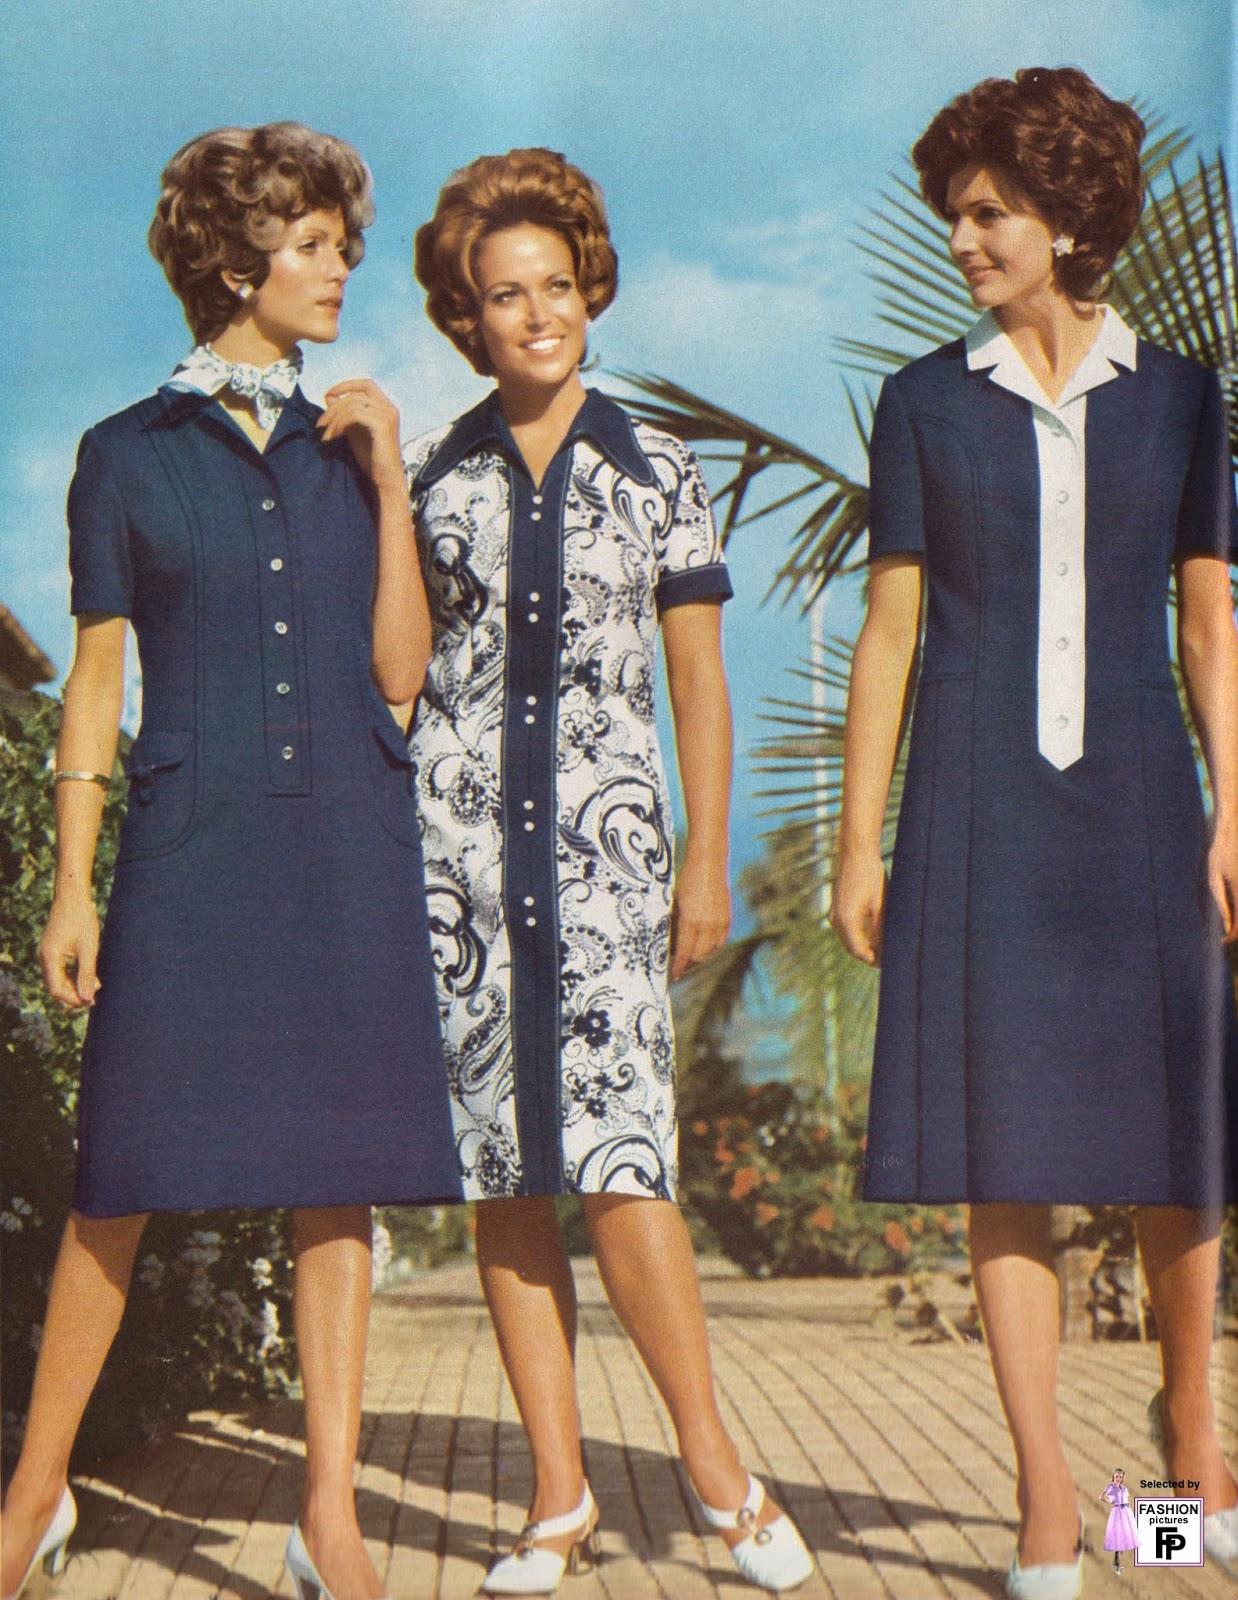 Мода 70 х годов фото платья и прически в ссср фото